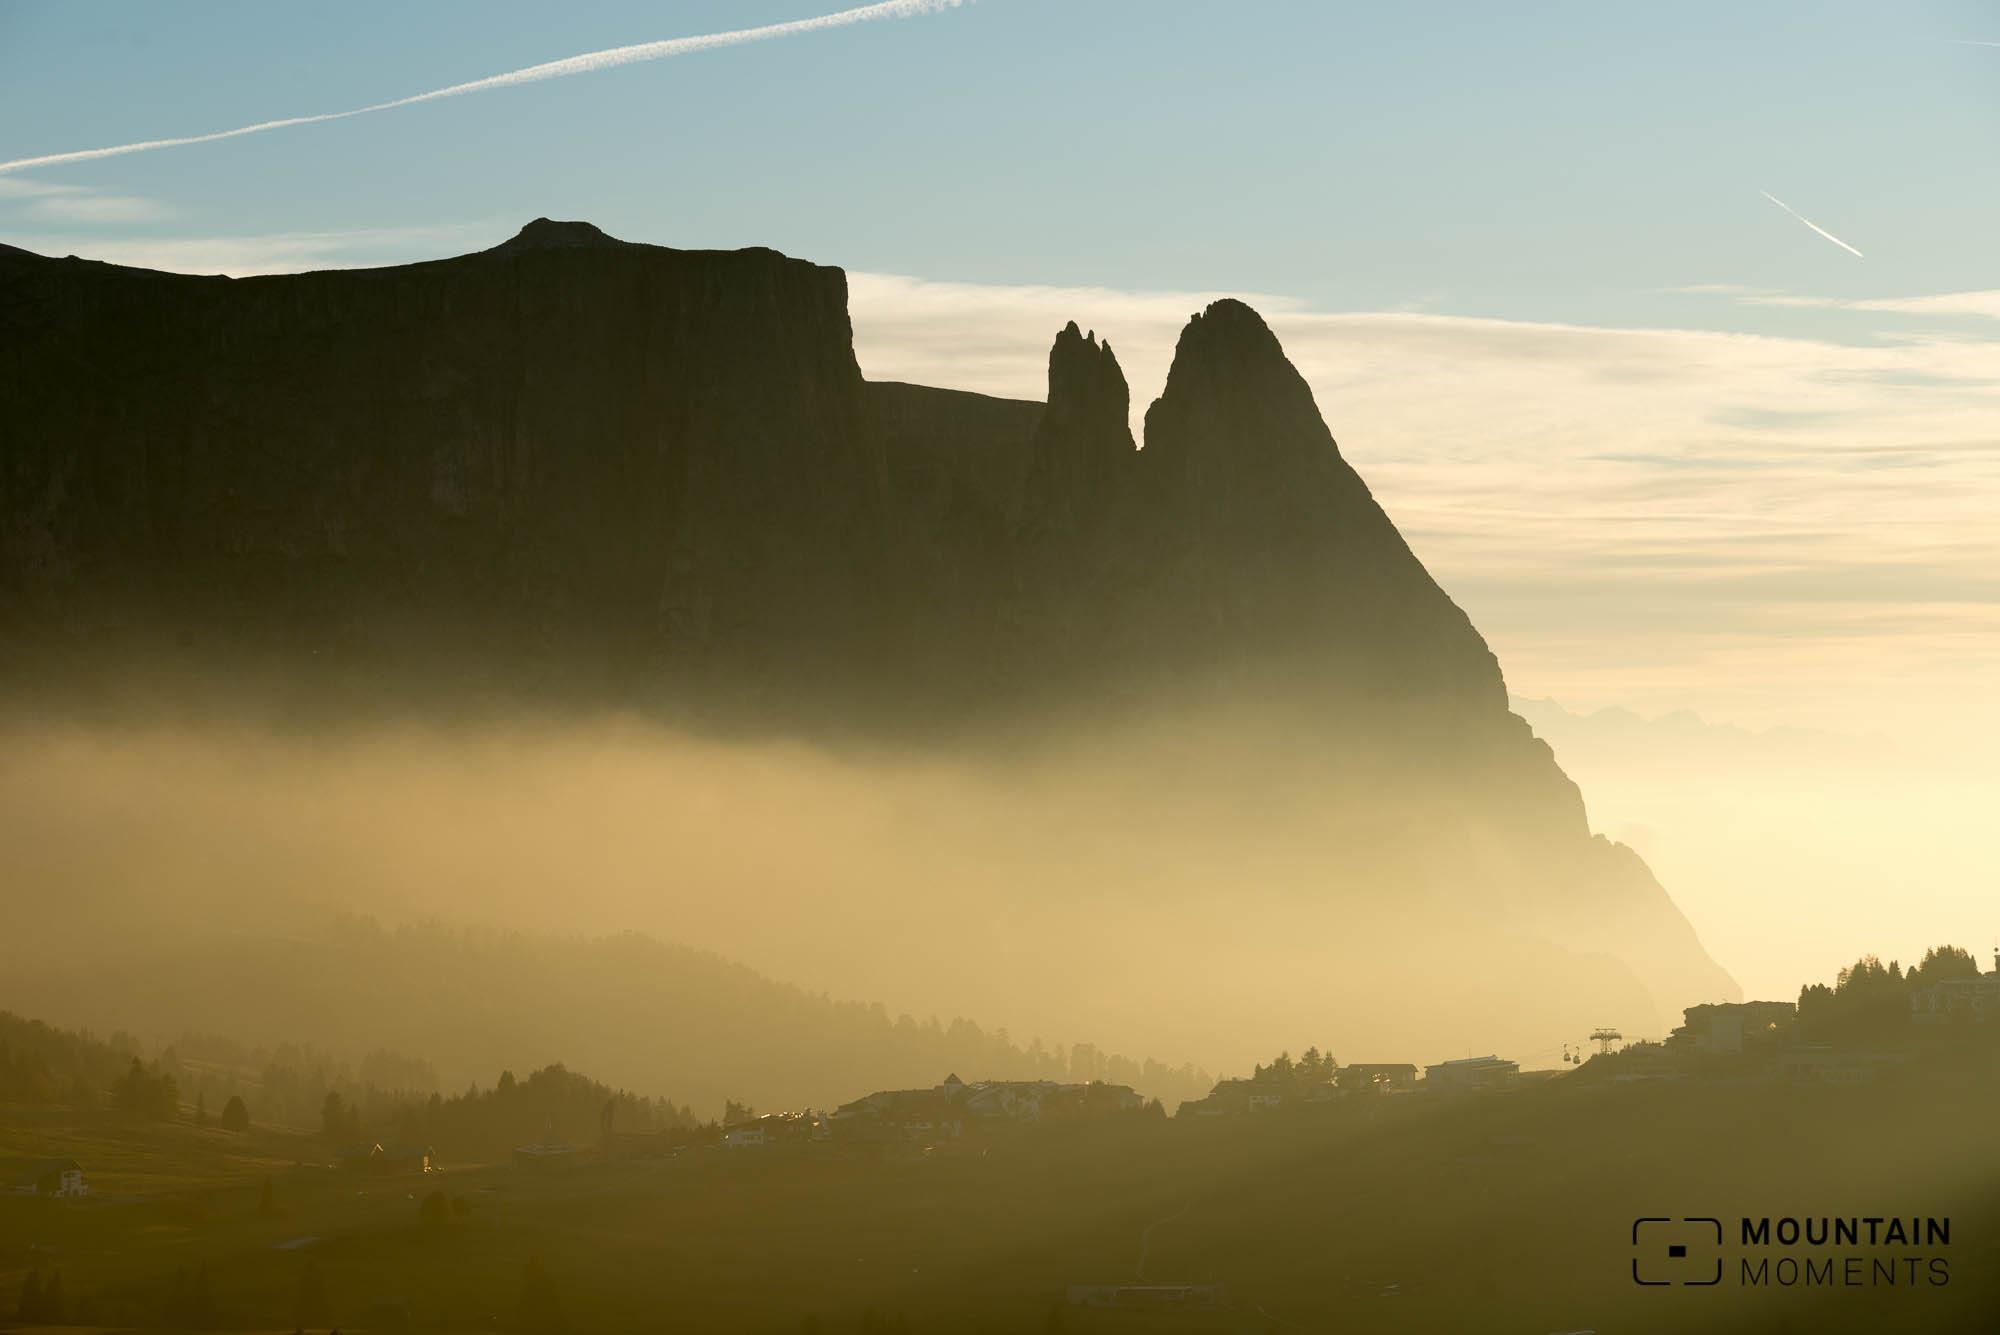 bergfotografie dolomiten, bergfoto dolomiten, foto wandern dolomiten, foto workshop dolomiten, fotoreise dolomiten